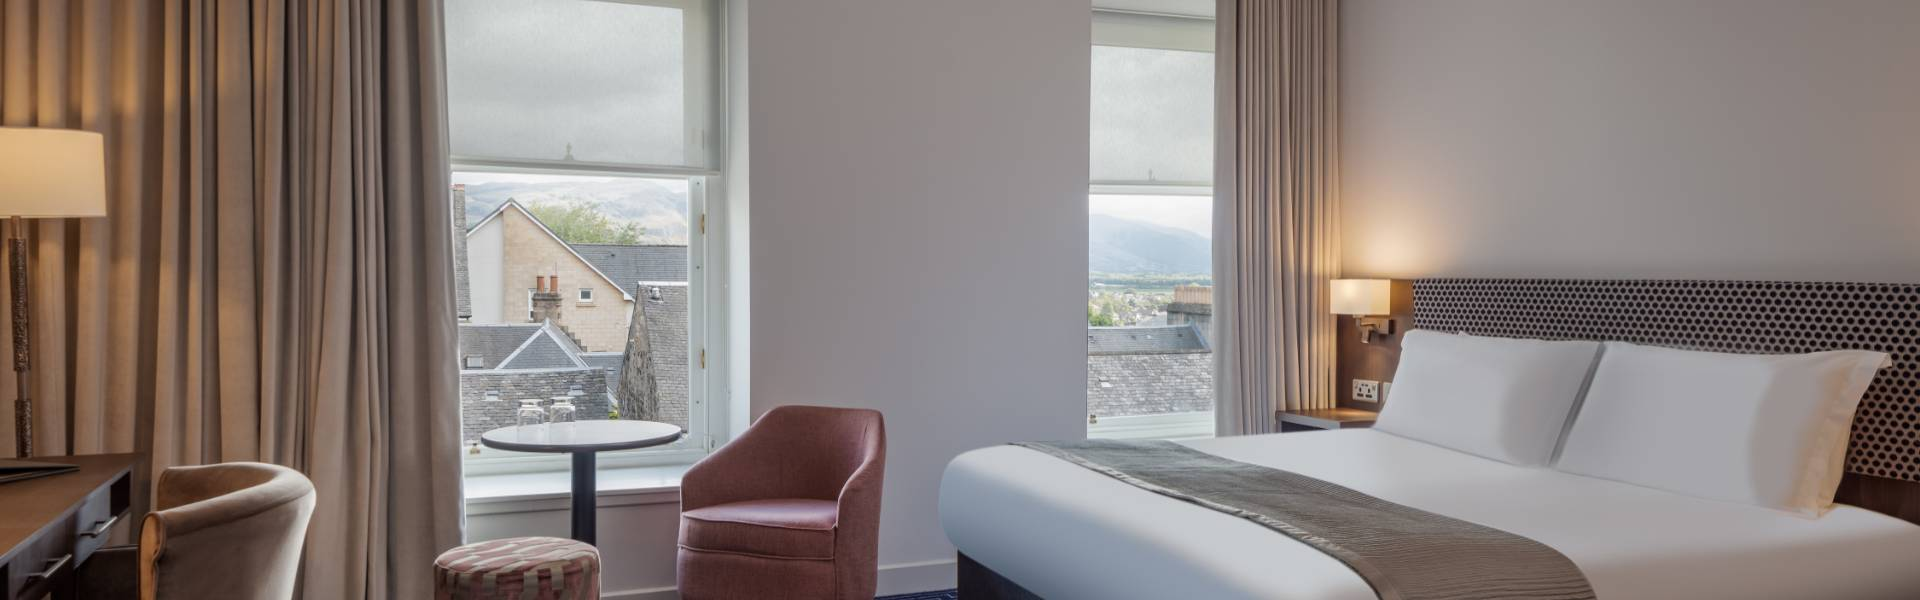 hotelCclessio_Bedroom_Premium_King_1920x600